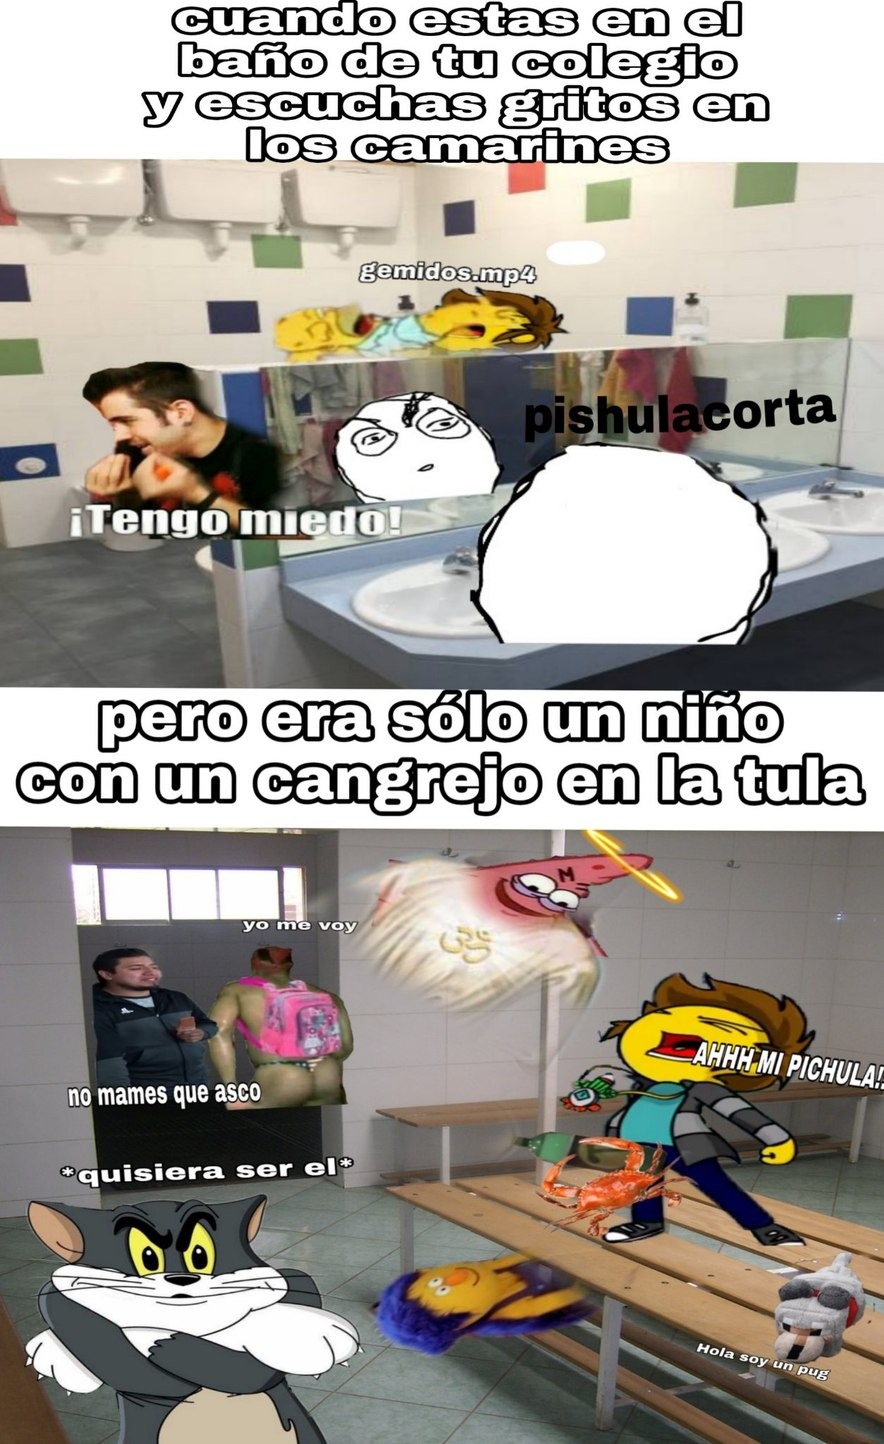 Cangrejo pro - meme